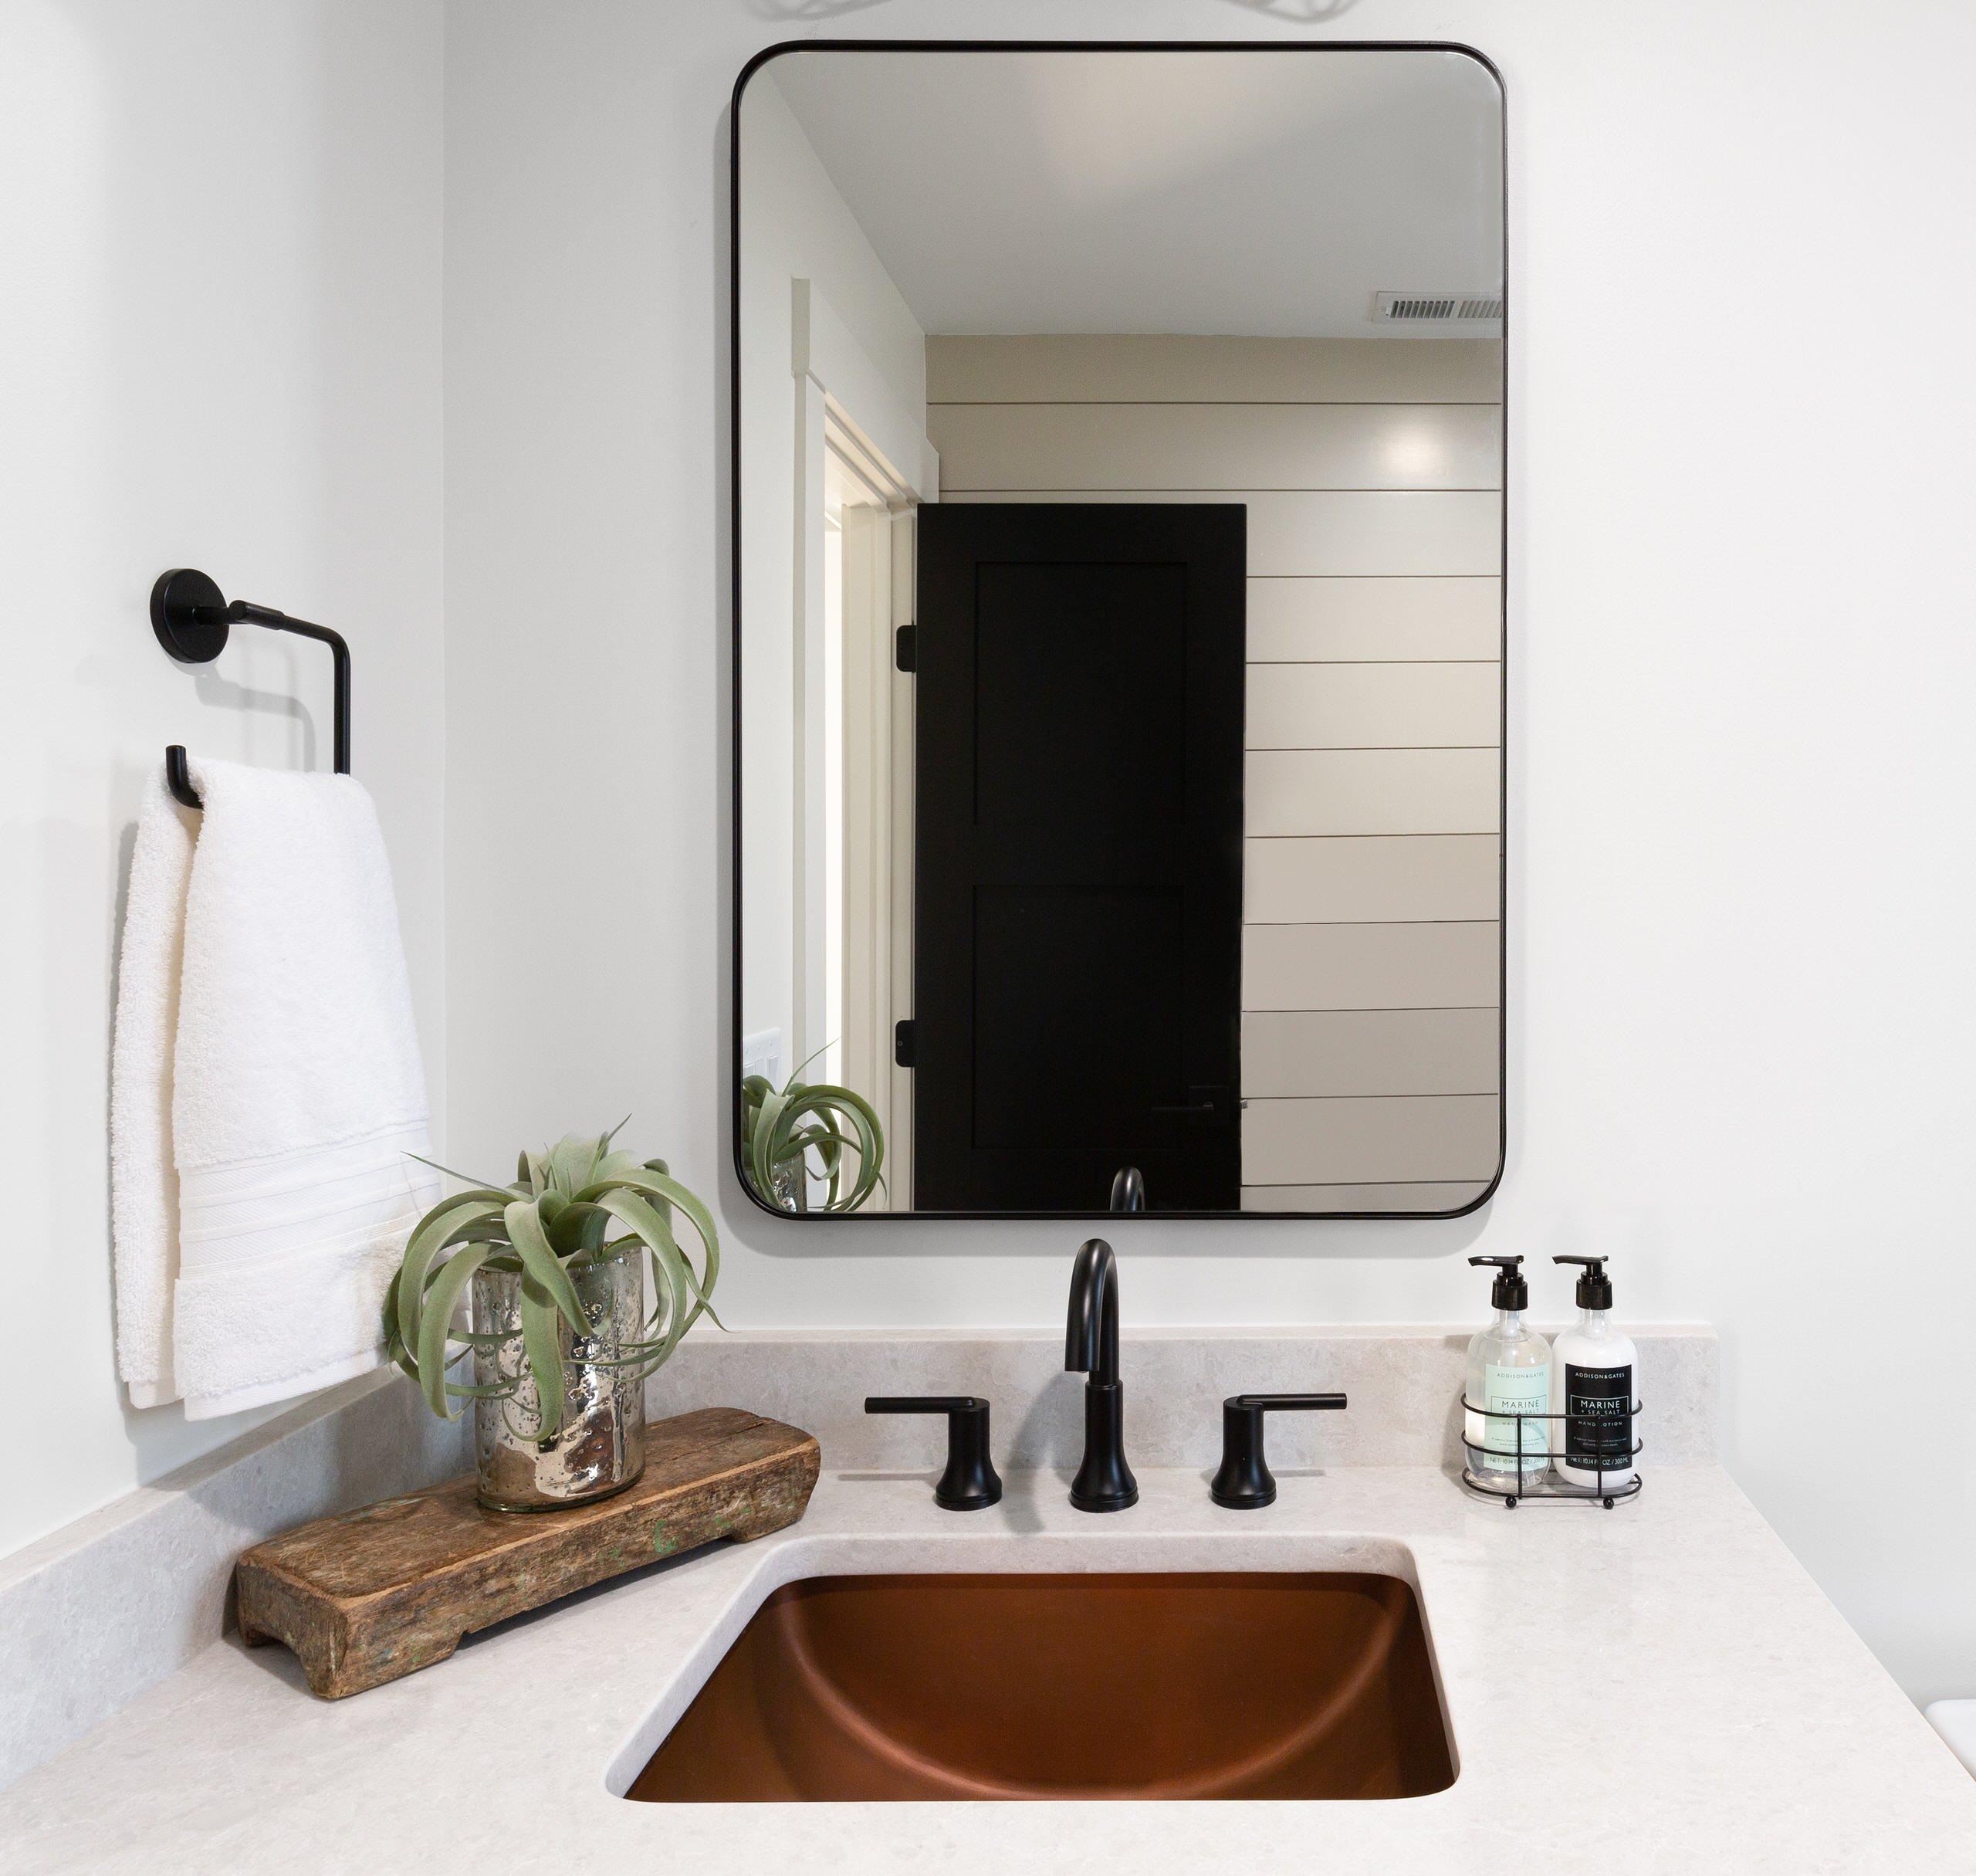 Hall bathroom details